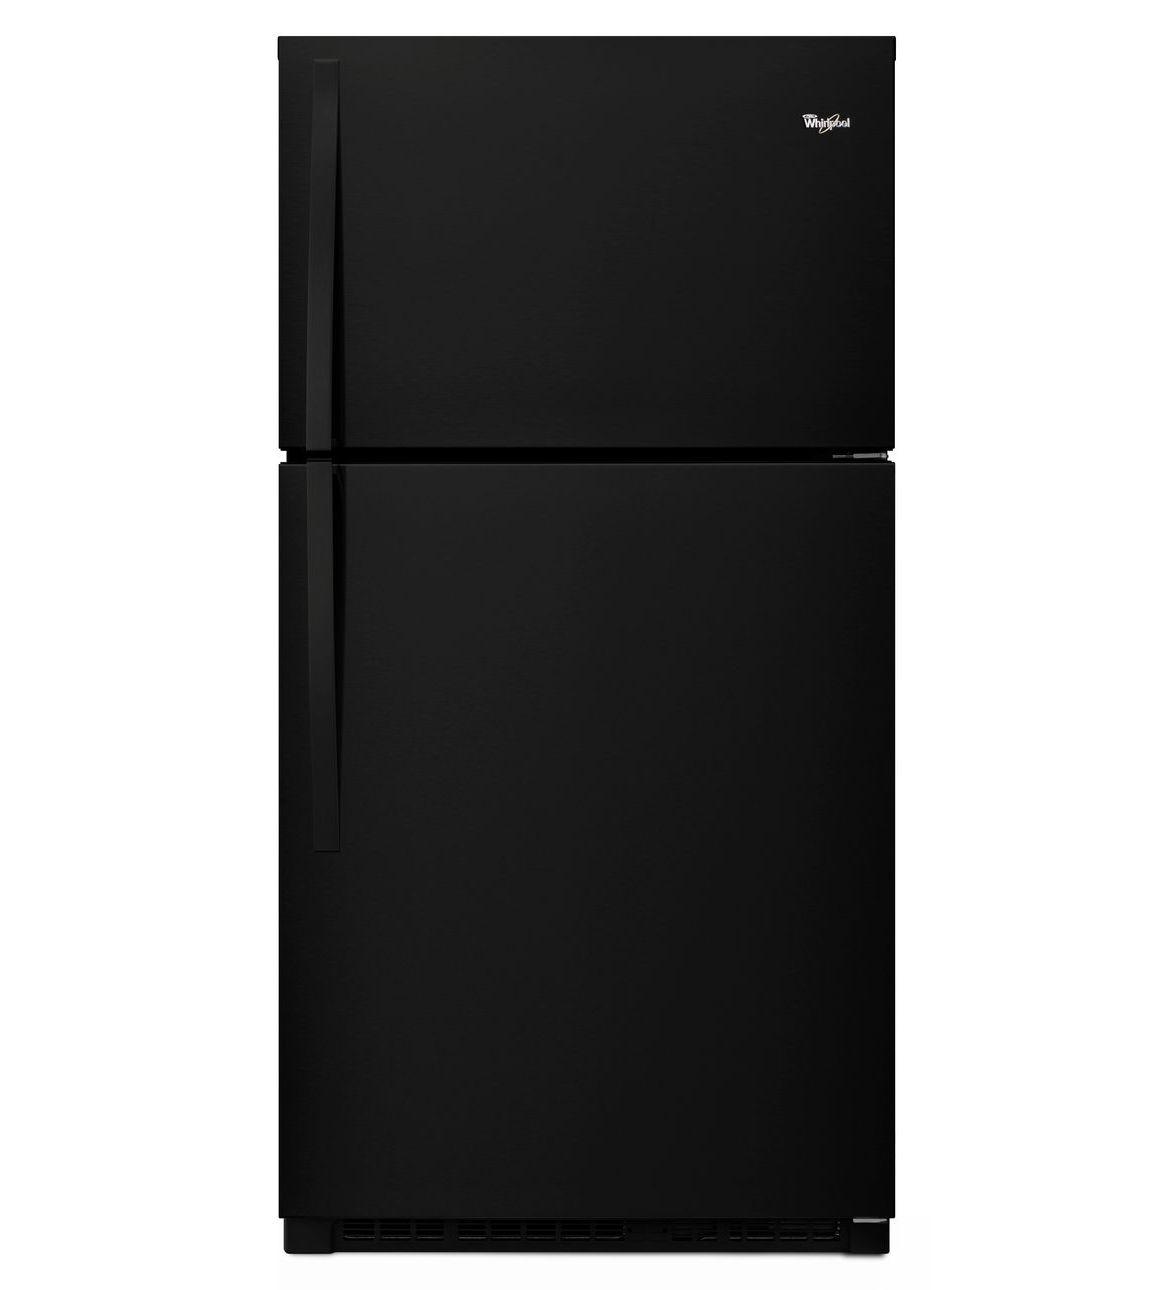 Whirlpool 33 Inch Wide Top Freezer Refrigerator More